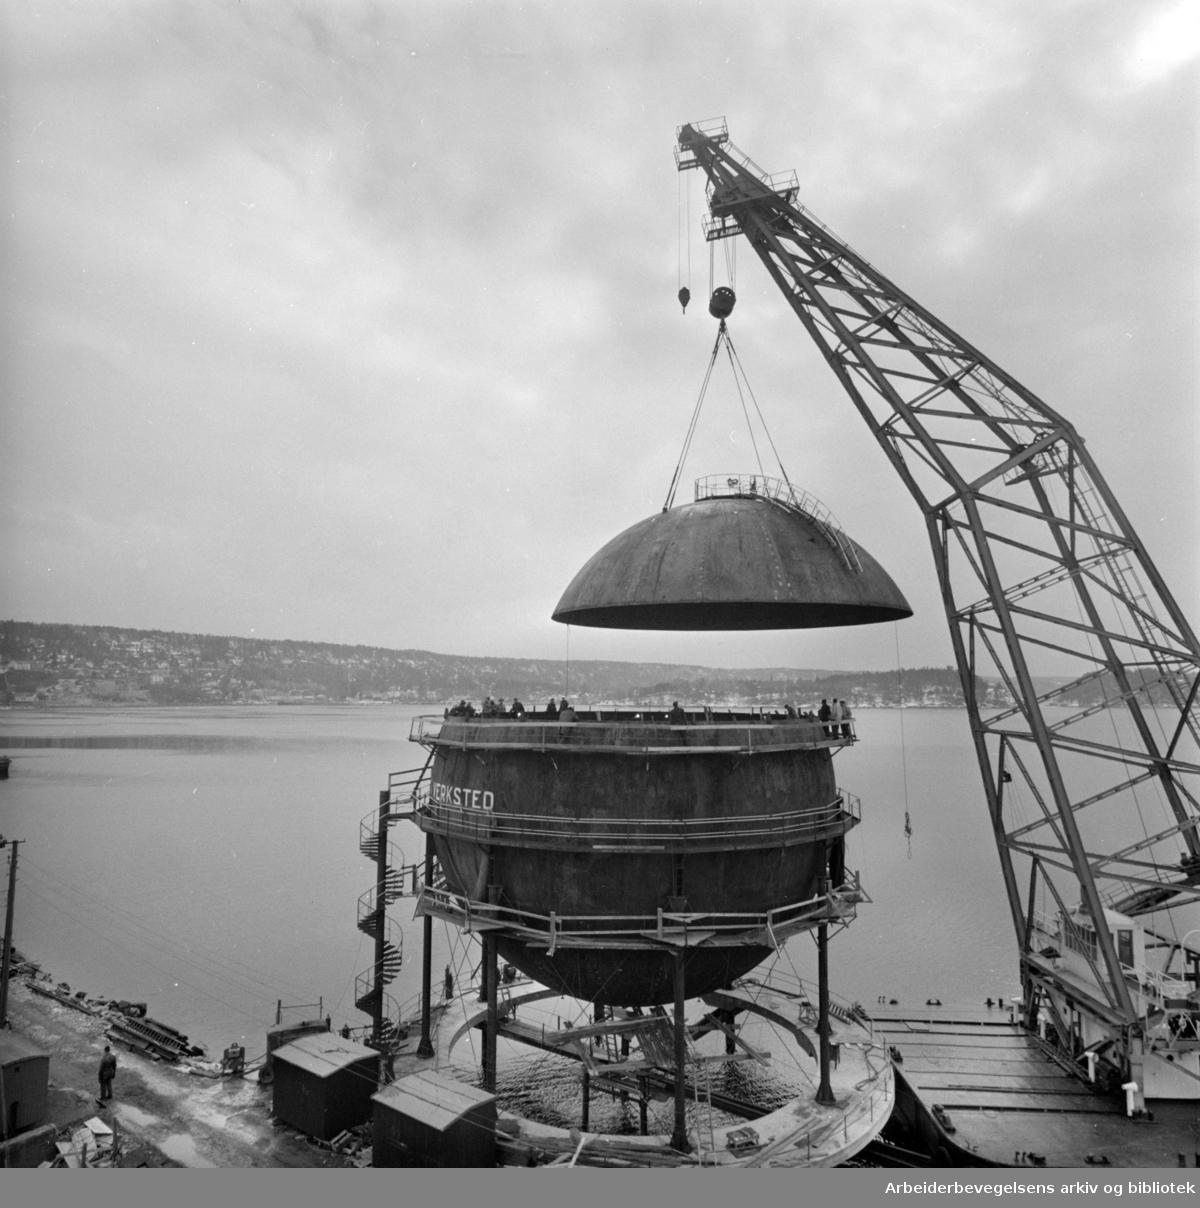 Sjursøya: Gassverket.Lettbensin - gassverket.April 1963